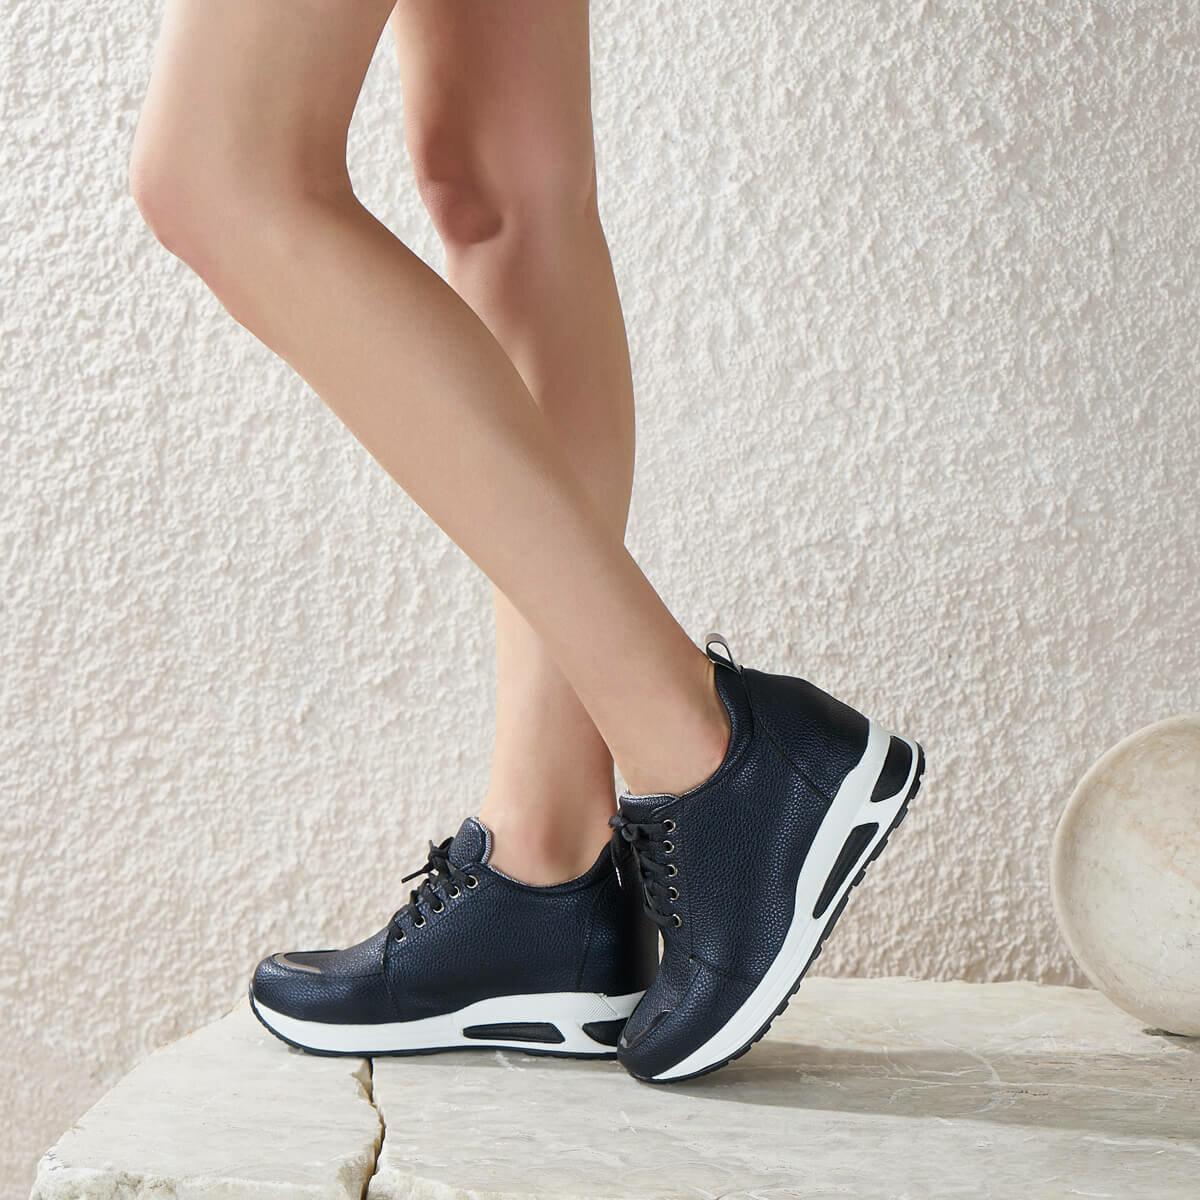 FLO HAMO85Z SKIN Black Women Shoes BUTIGO